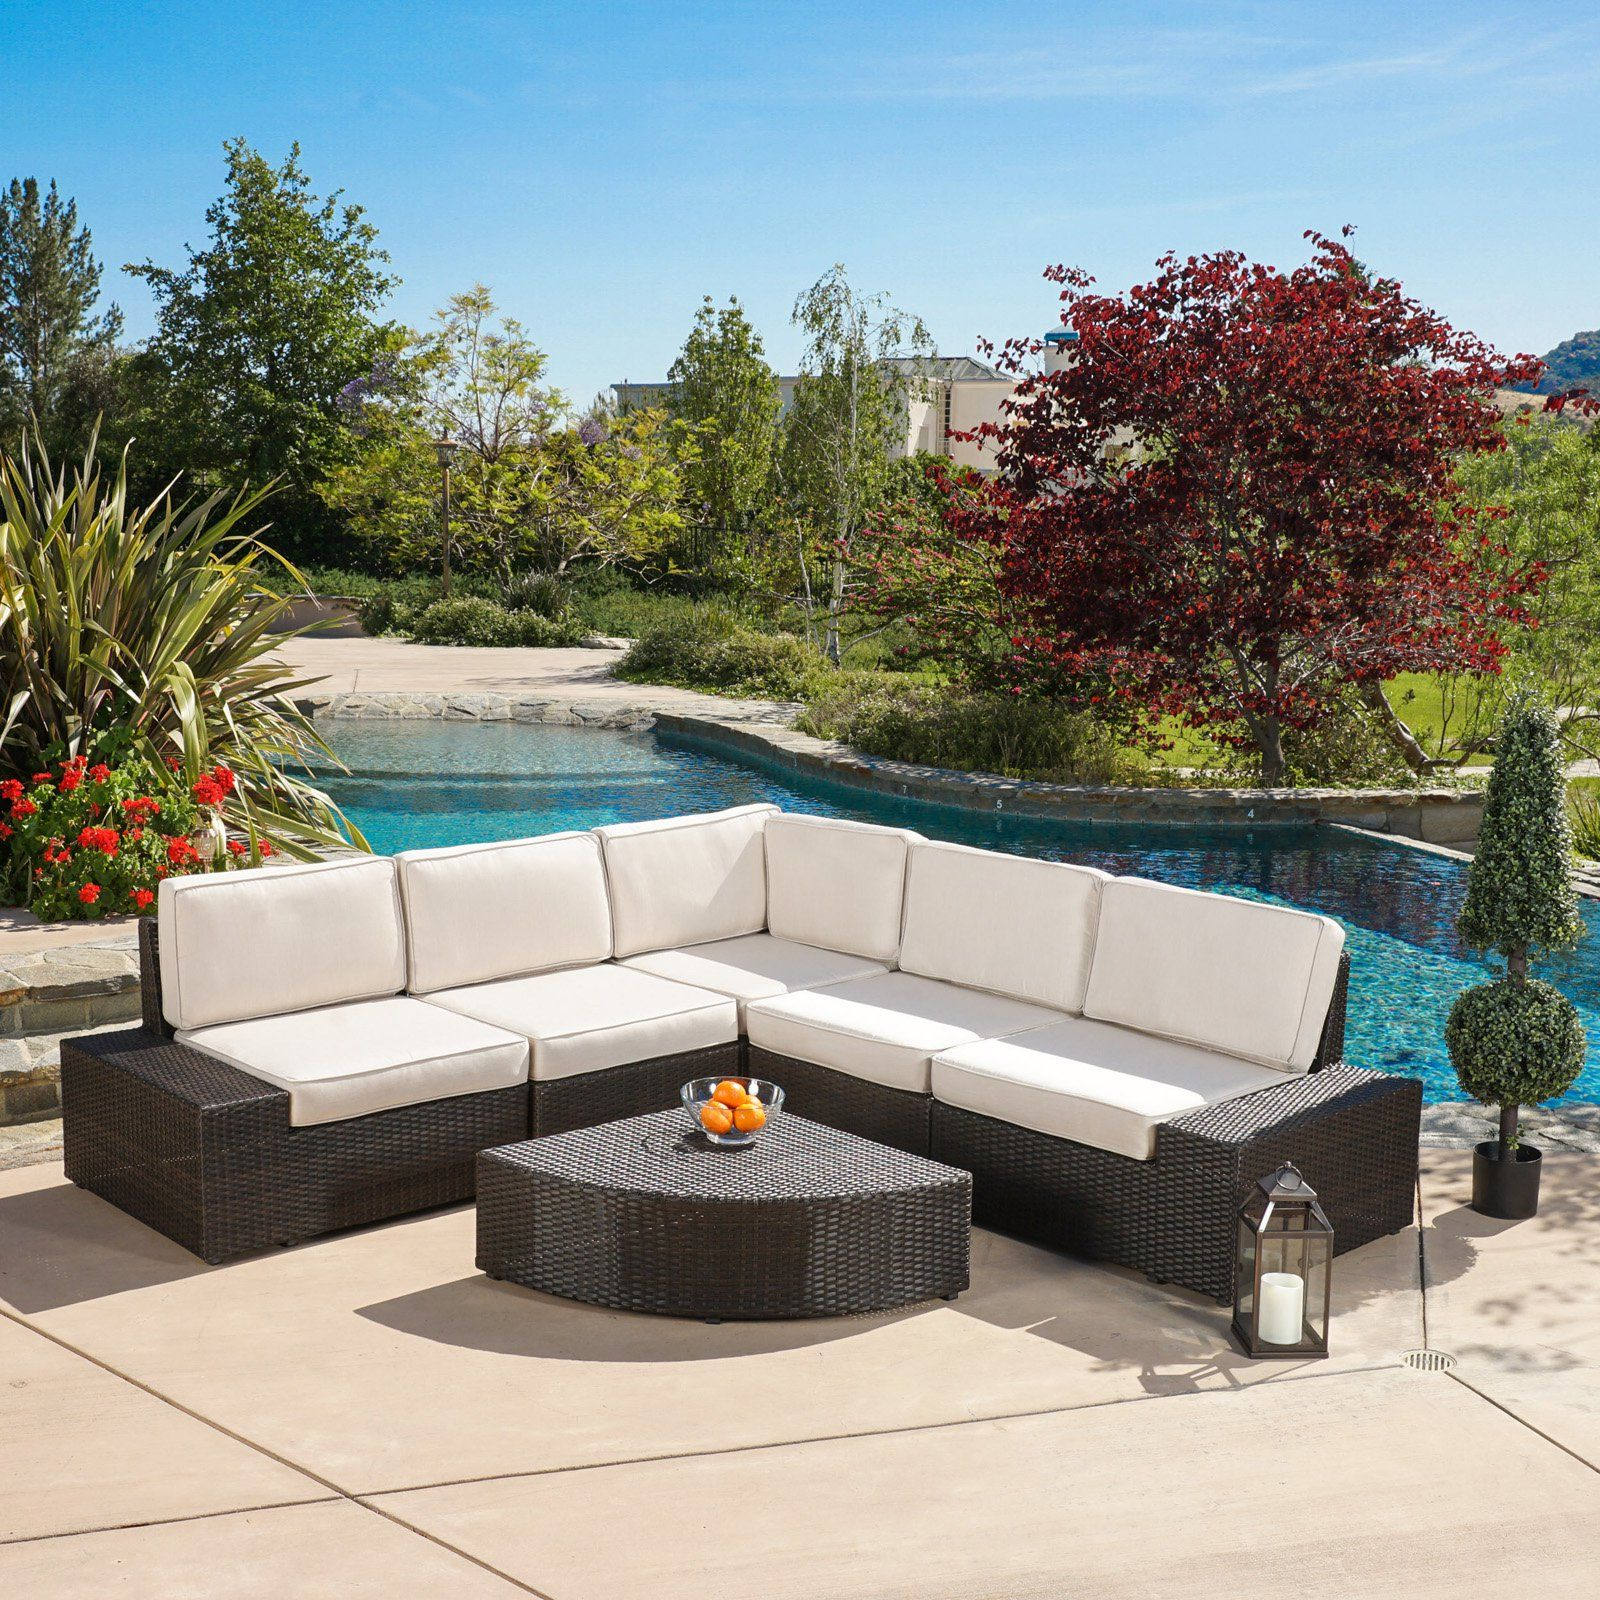 Zora Outdoor 6 Piece Sofa Conversation Set Sectional Patio